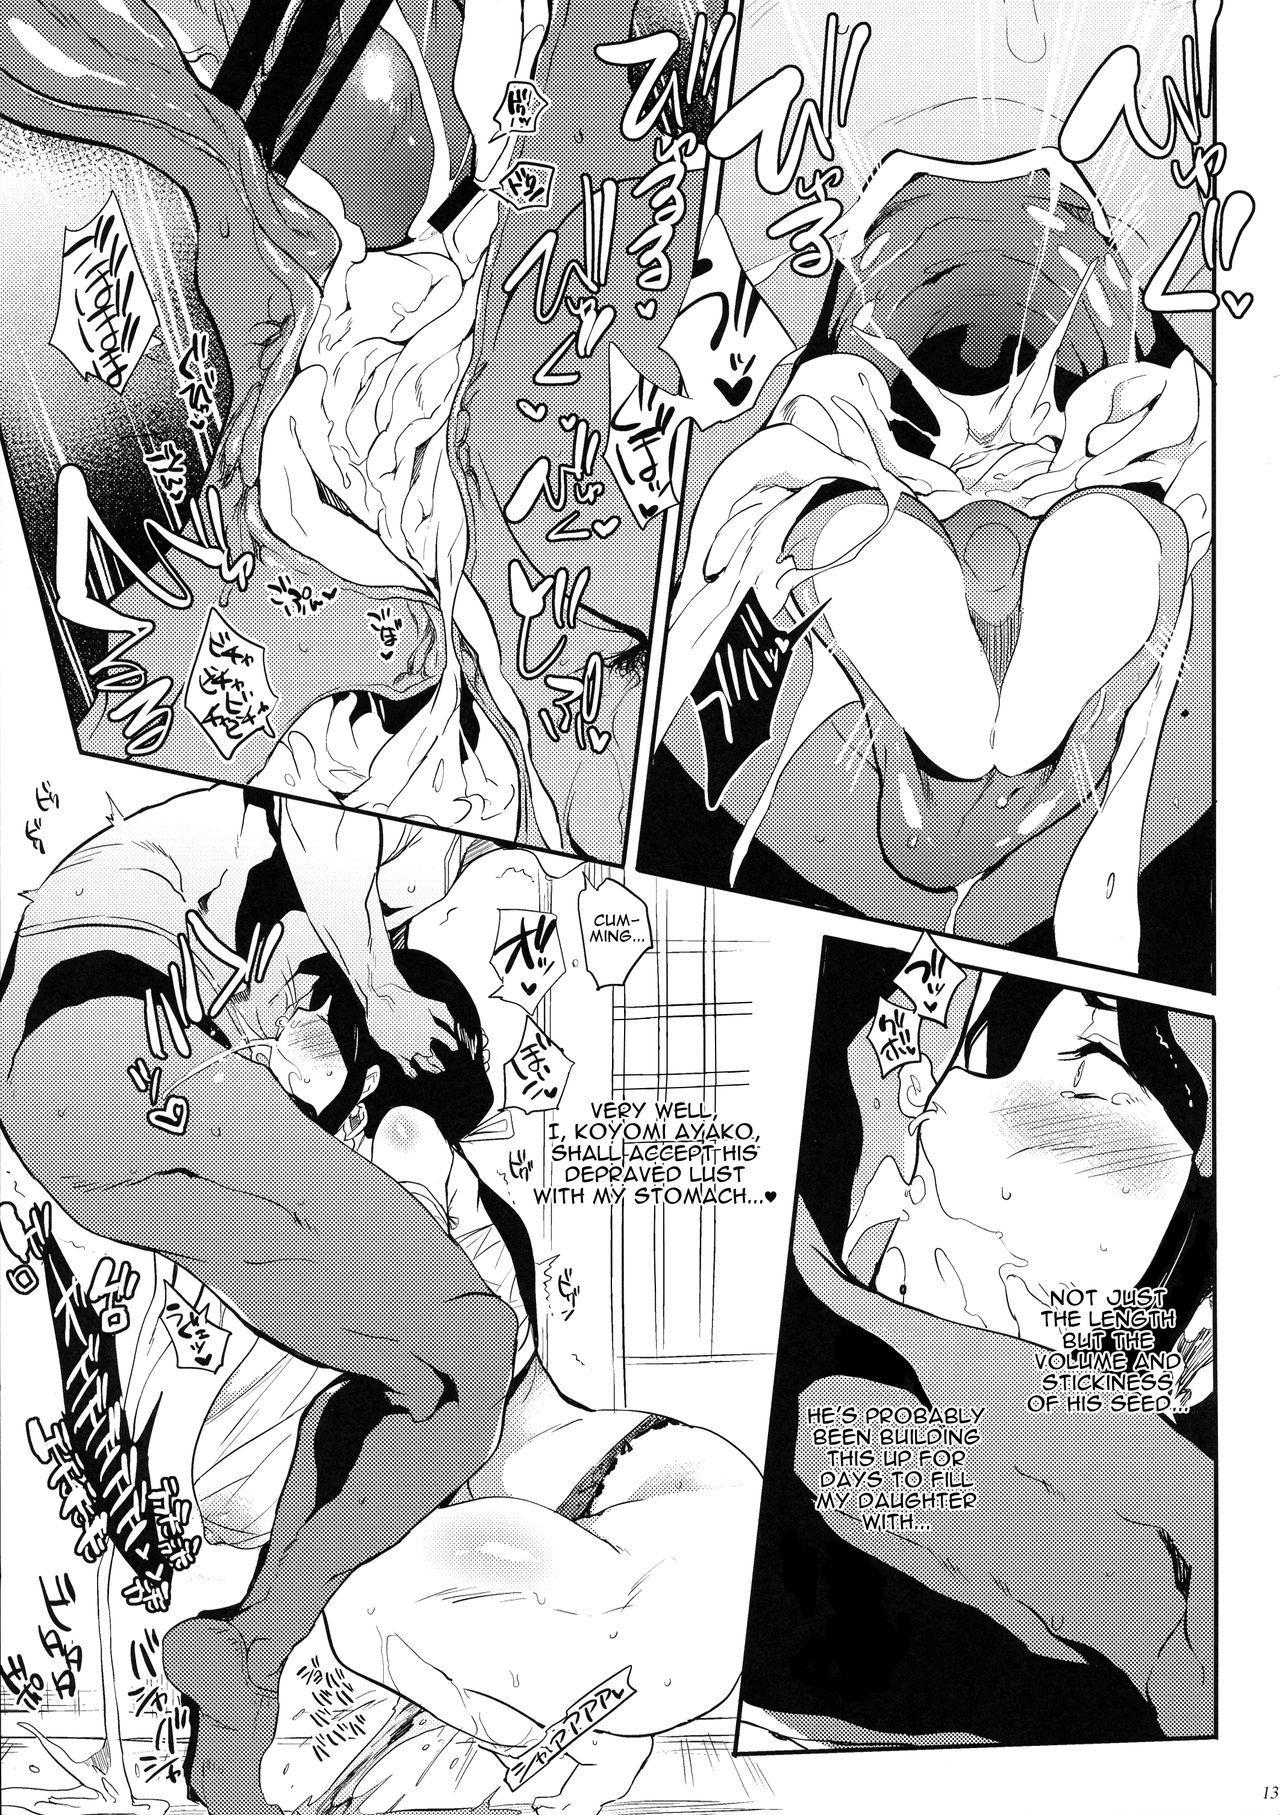 Taima no Haha | Demon Slayer Mother 12